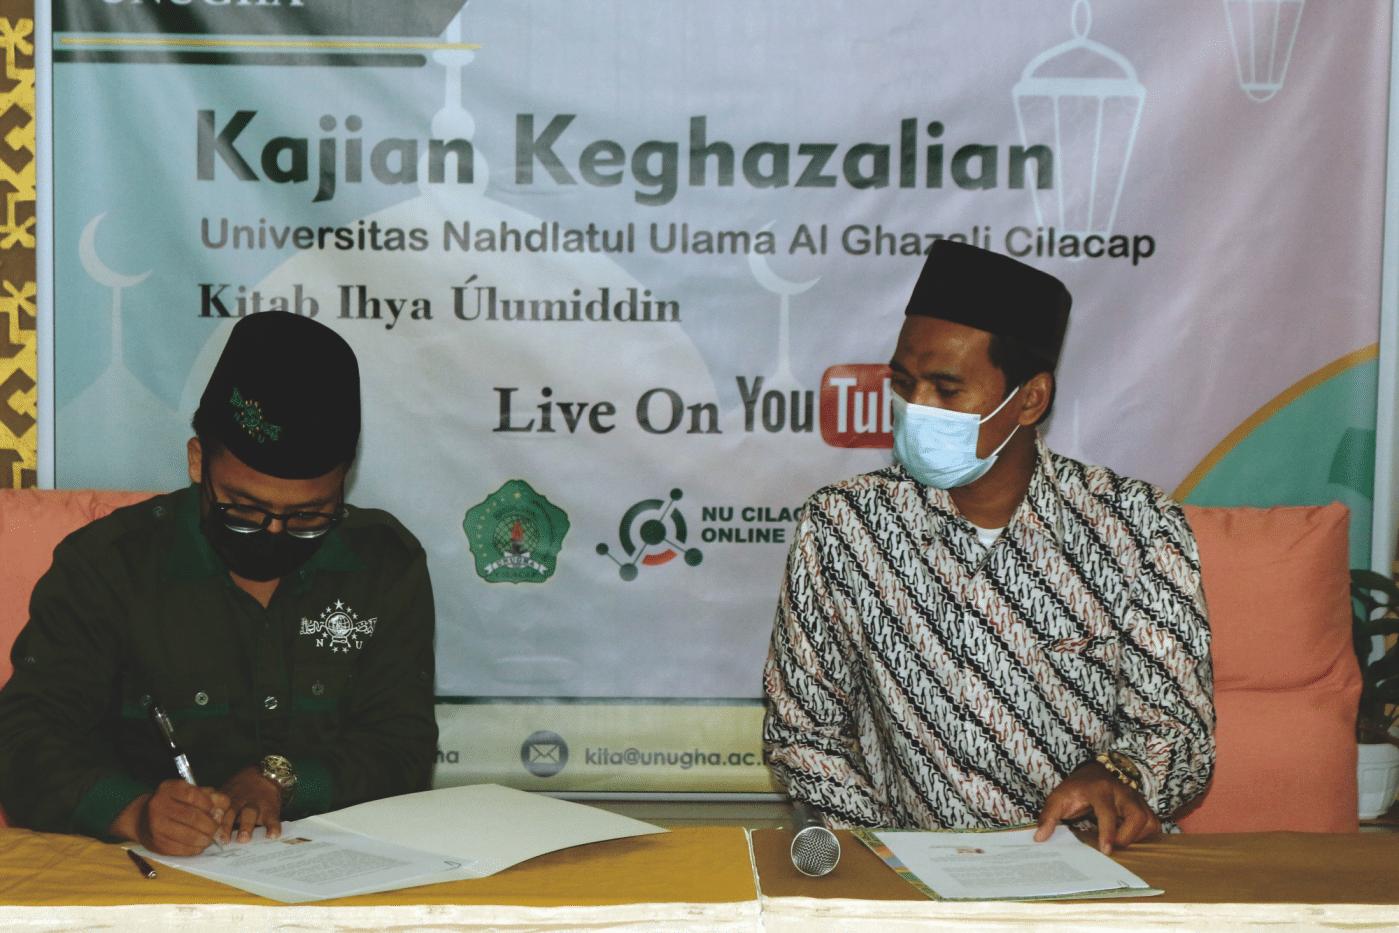 NU Cilacap Official Media (NUCOM) bersinergi dengan UNUGHA